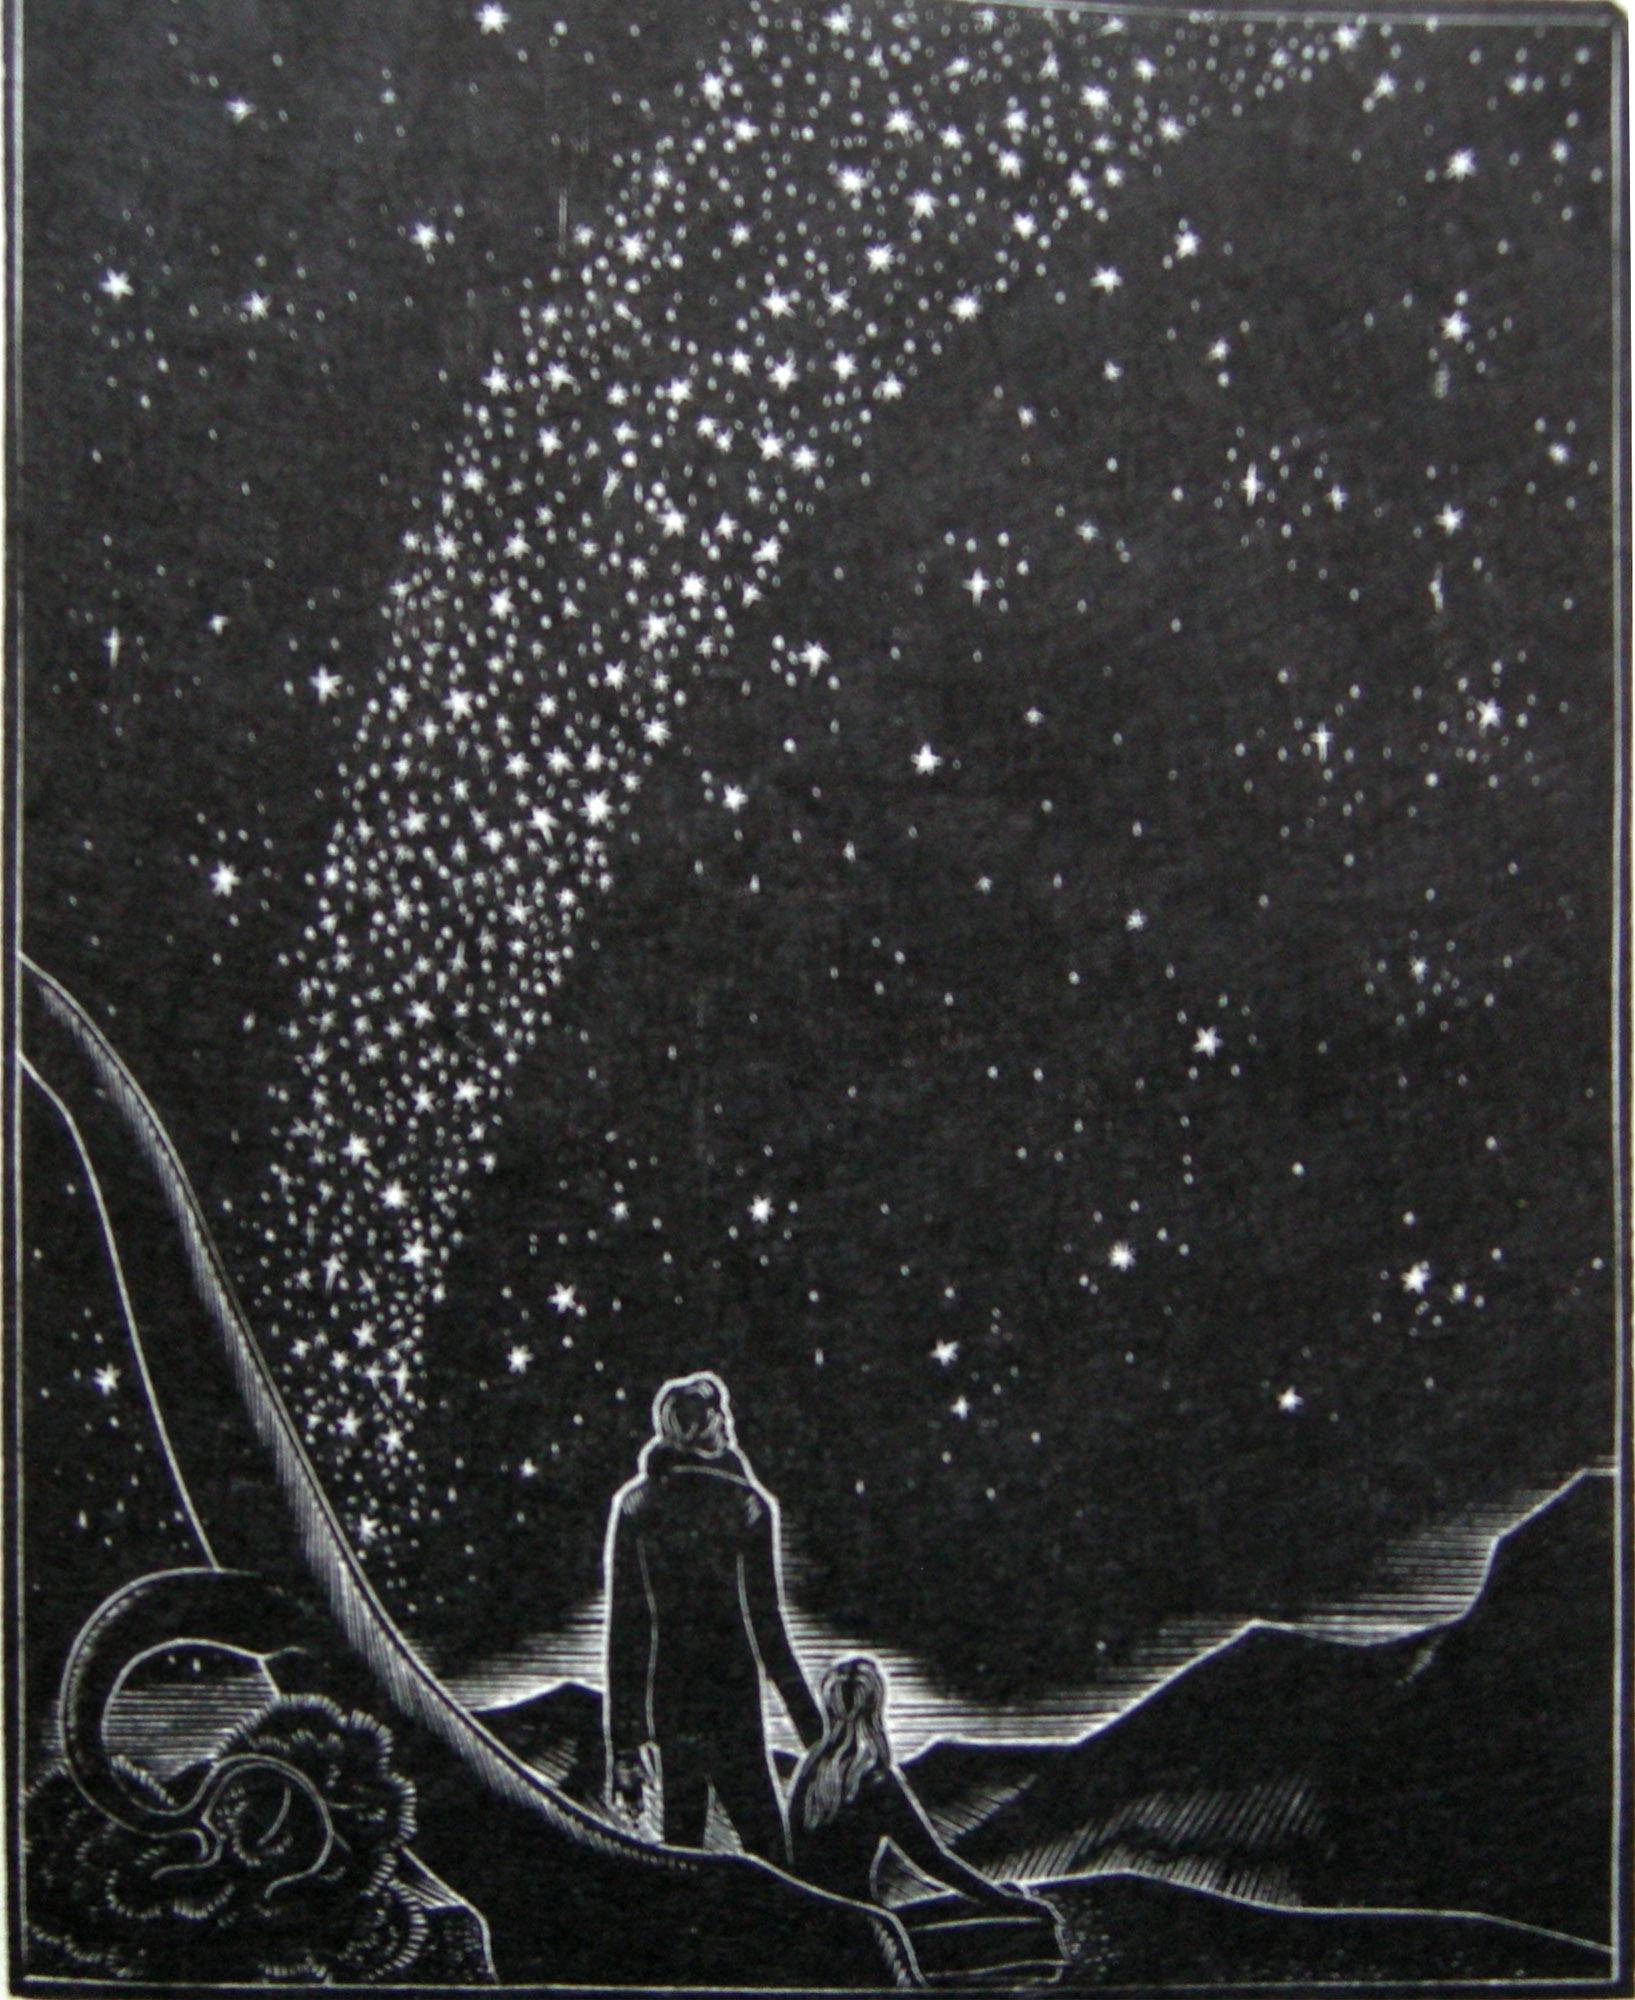 LYND WARD God's Man: The Milky Way